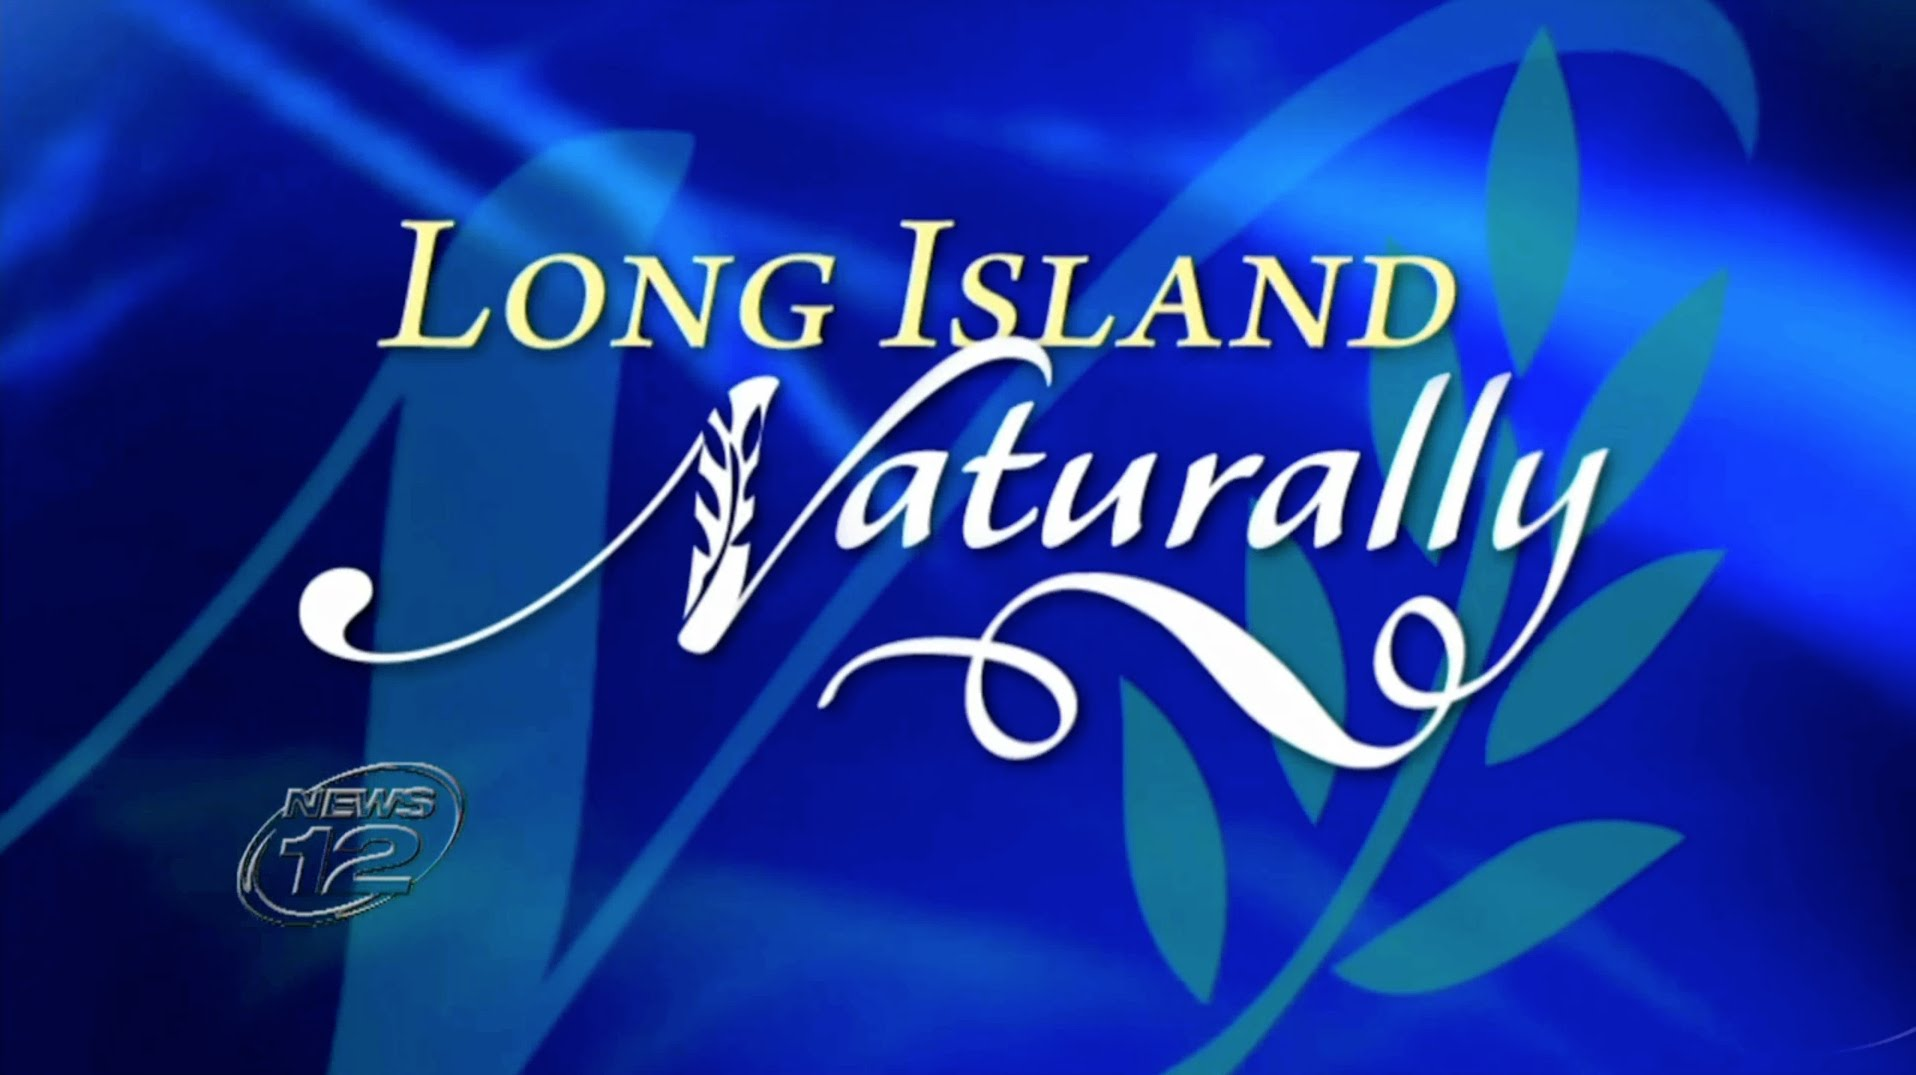 Long-Island-Naturlally